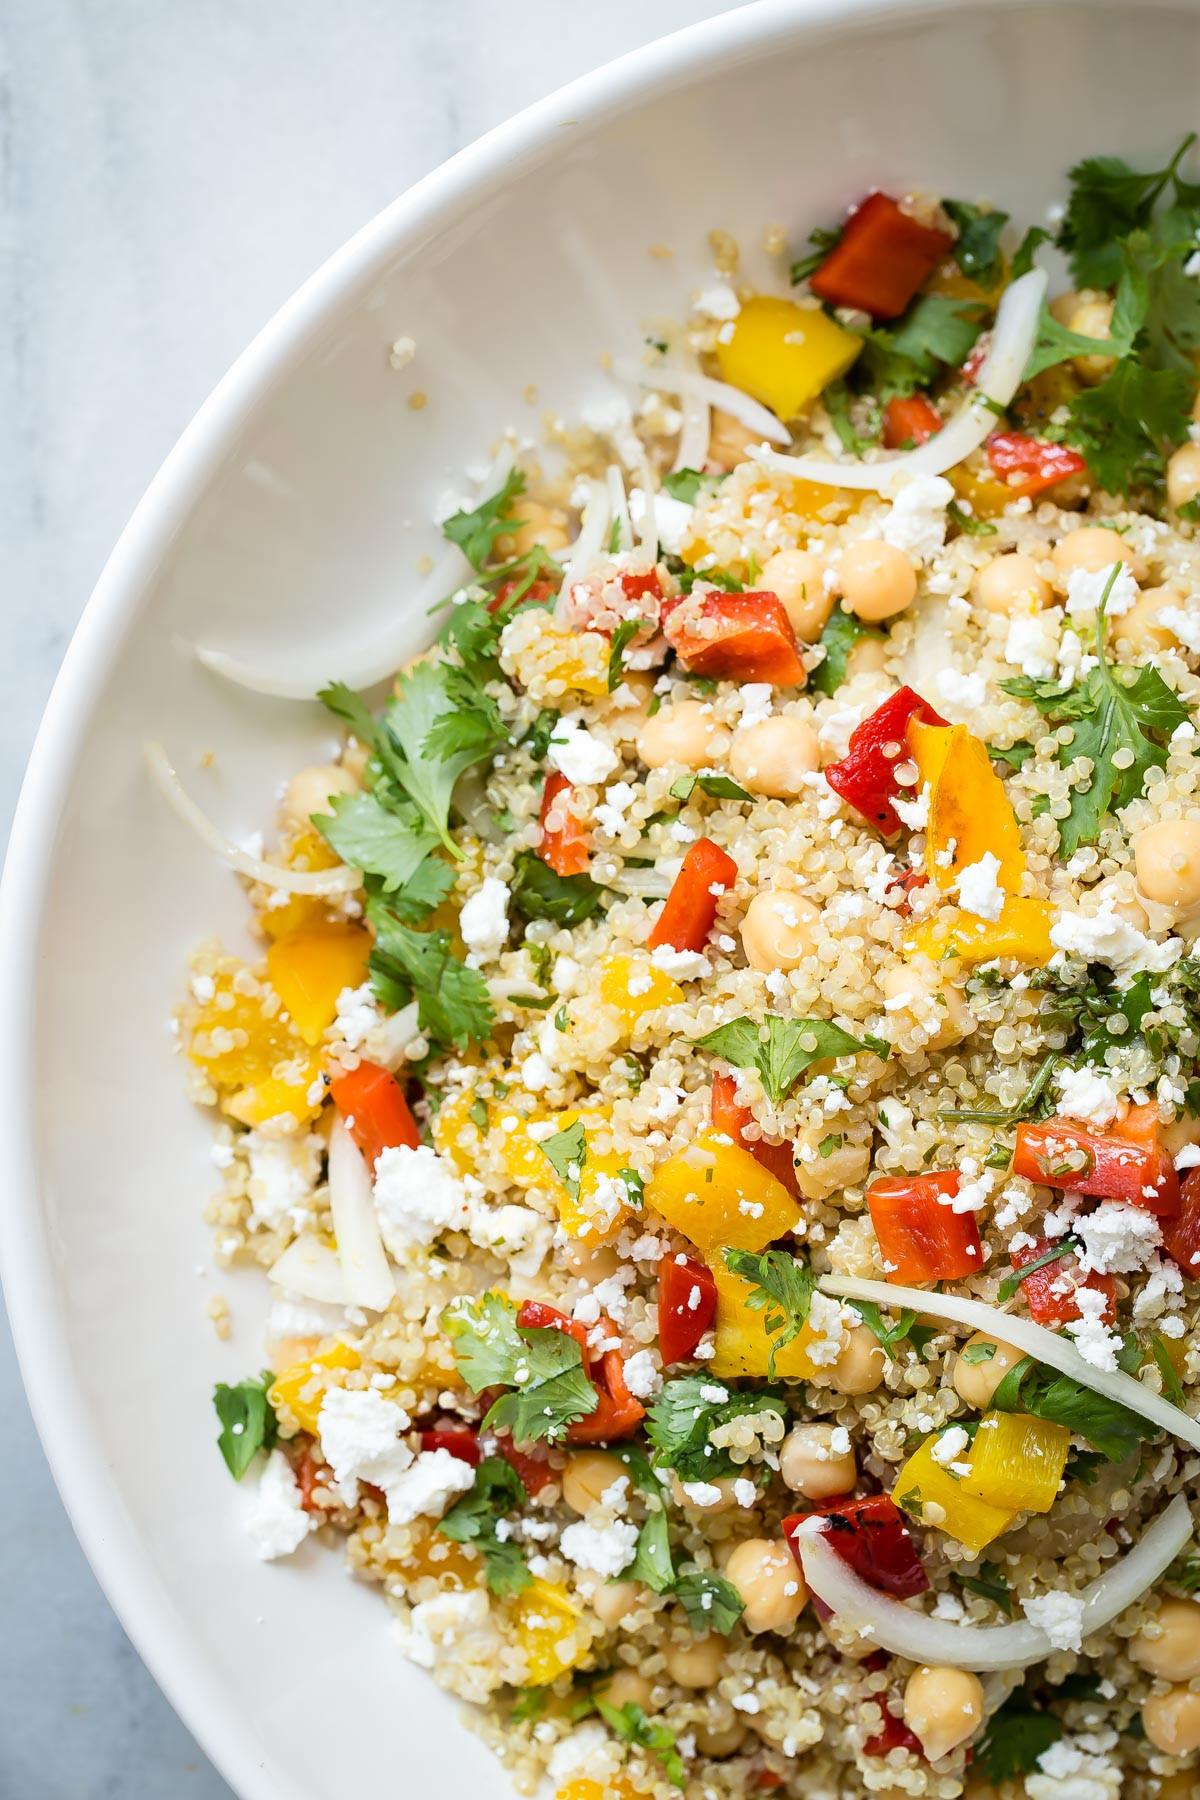 Quinoa Salad Healthy  Healthy Quinoa Salad with Feta Cheese